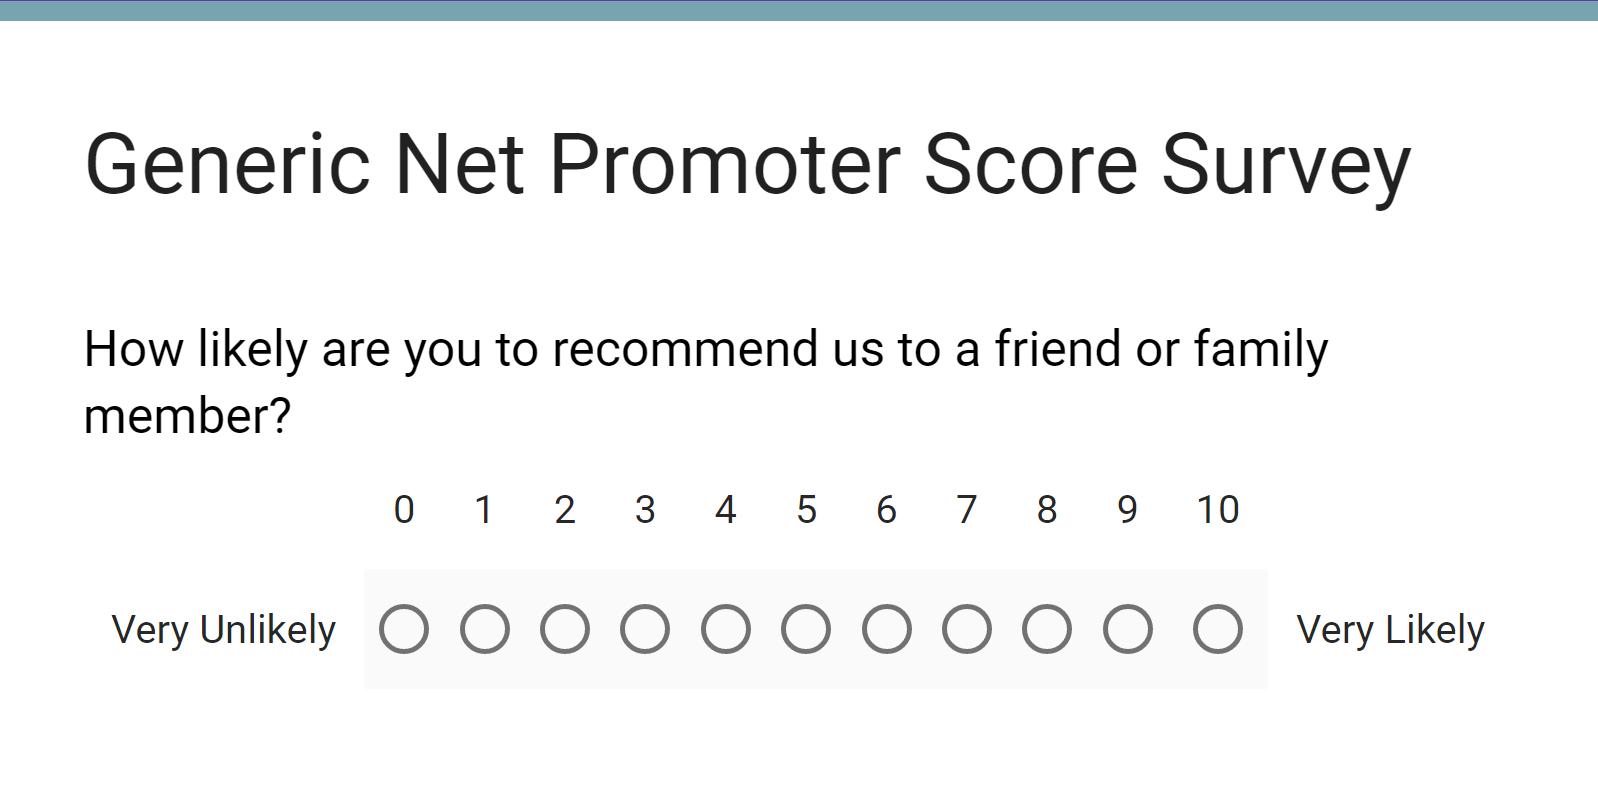 Generic Net Promoter Score Survey